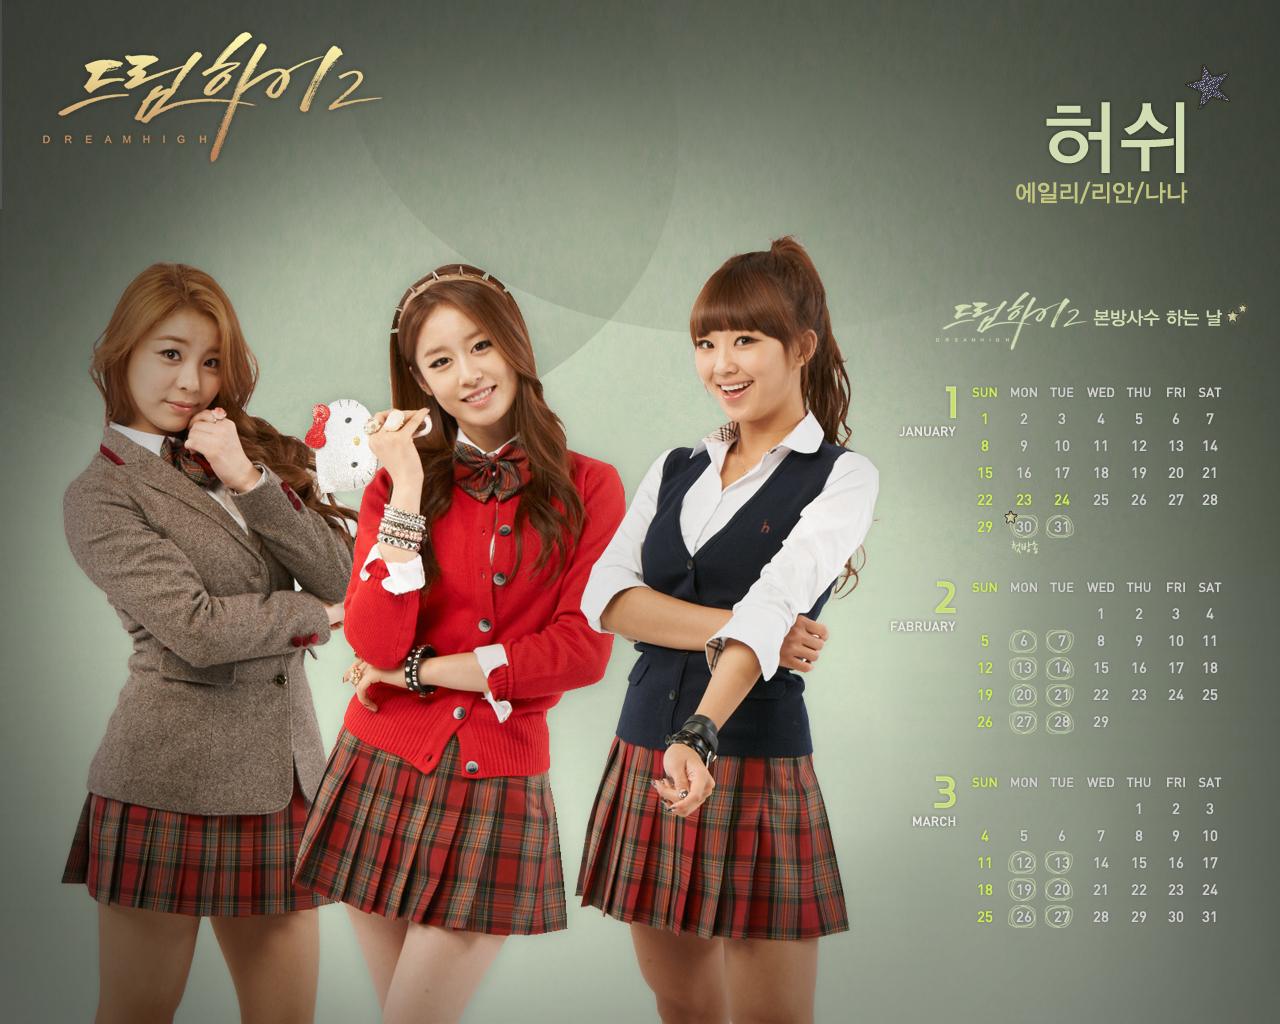 Autumn s concerto wallpaper - Credit Dream High 2 Website